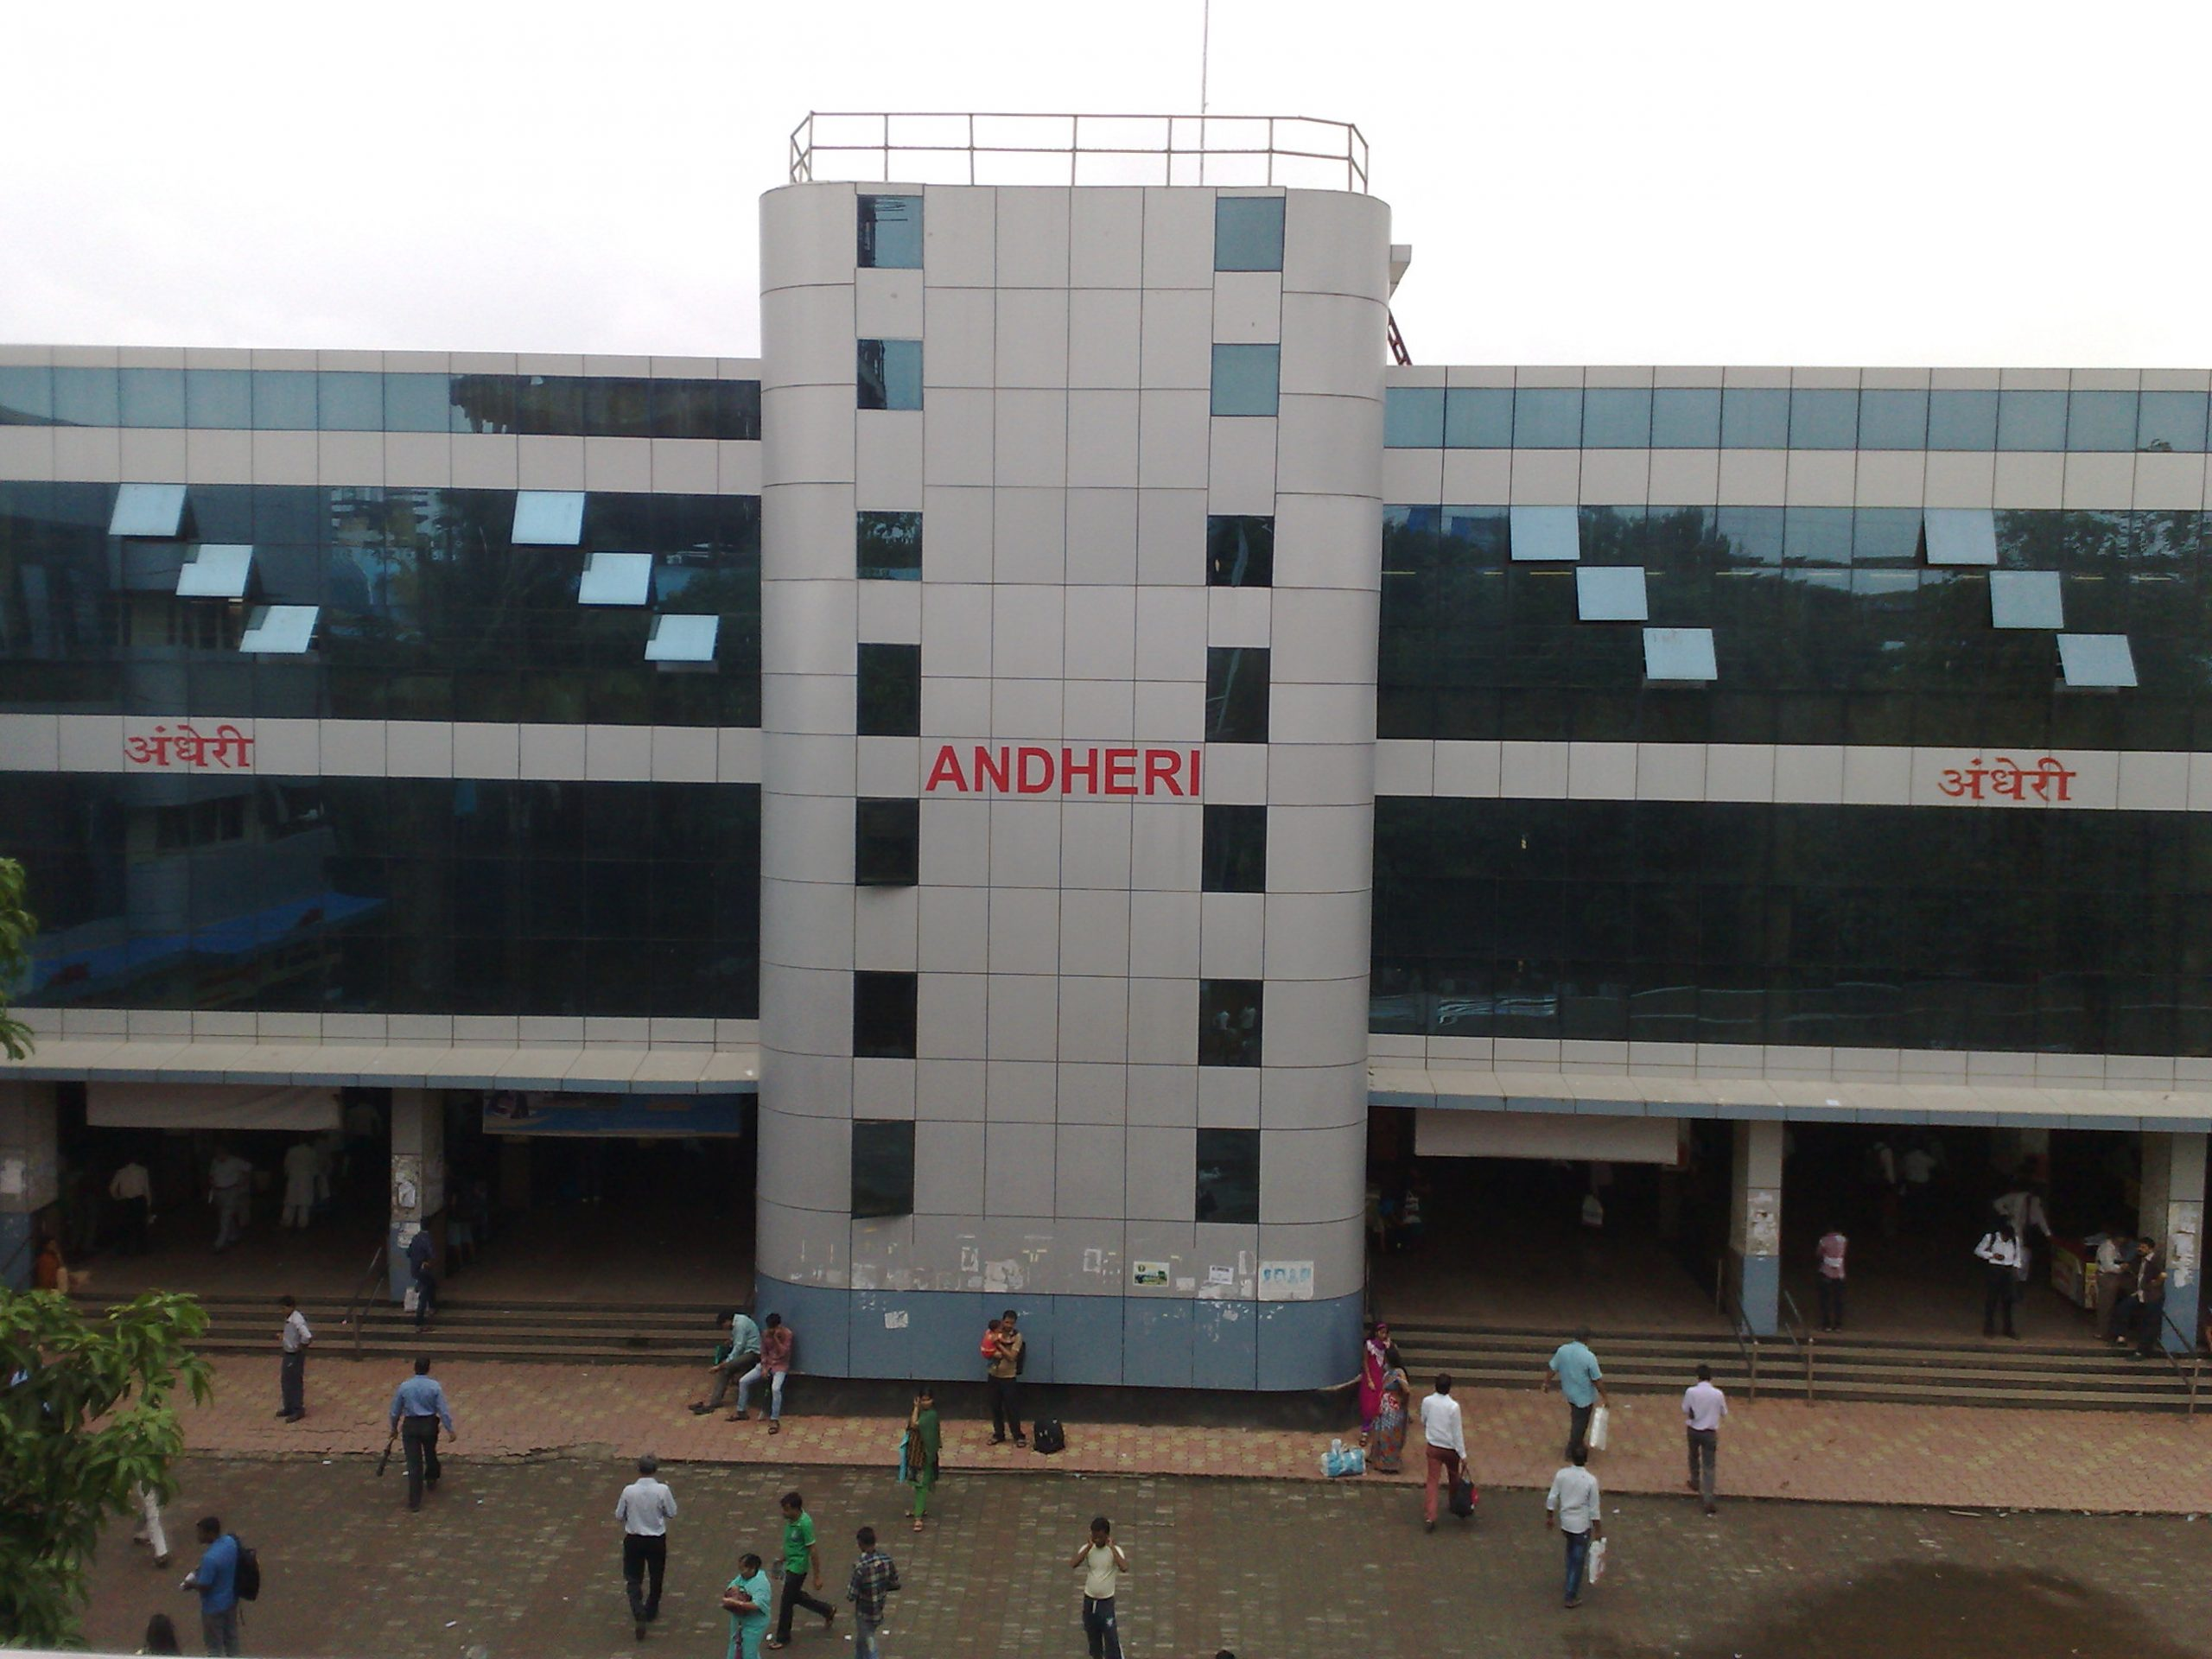 Best Place to Visit Near Versova Beach - Andheri